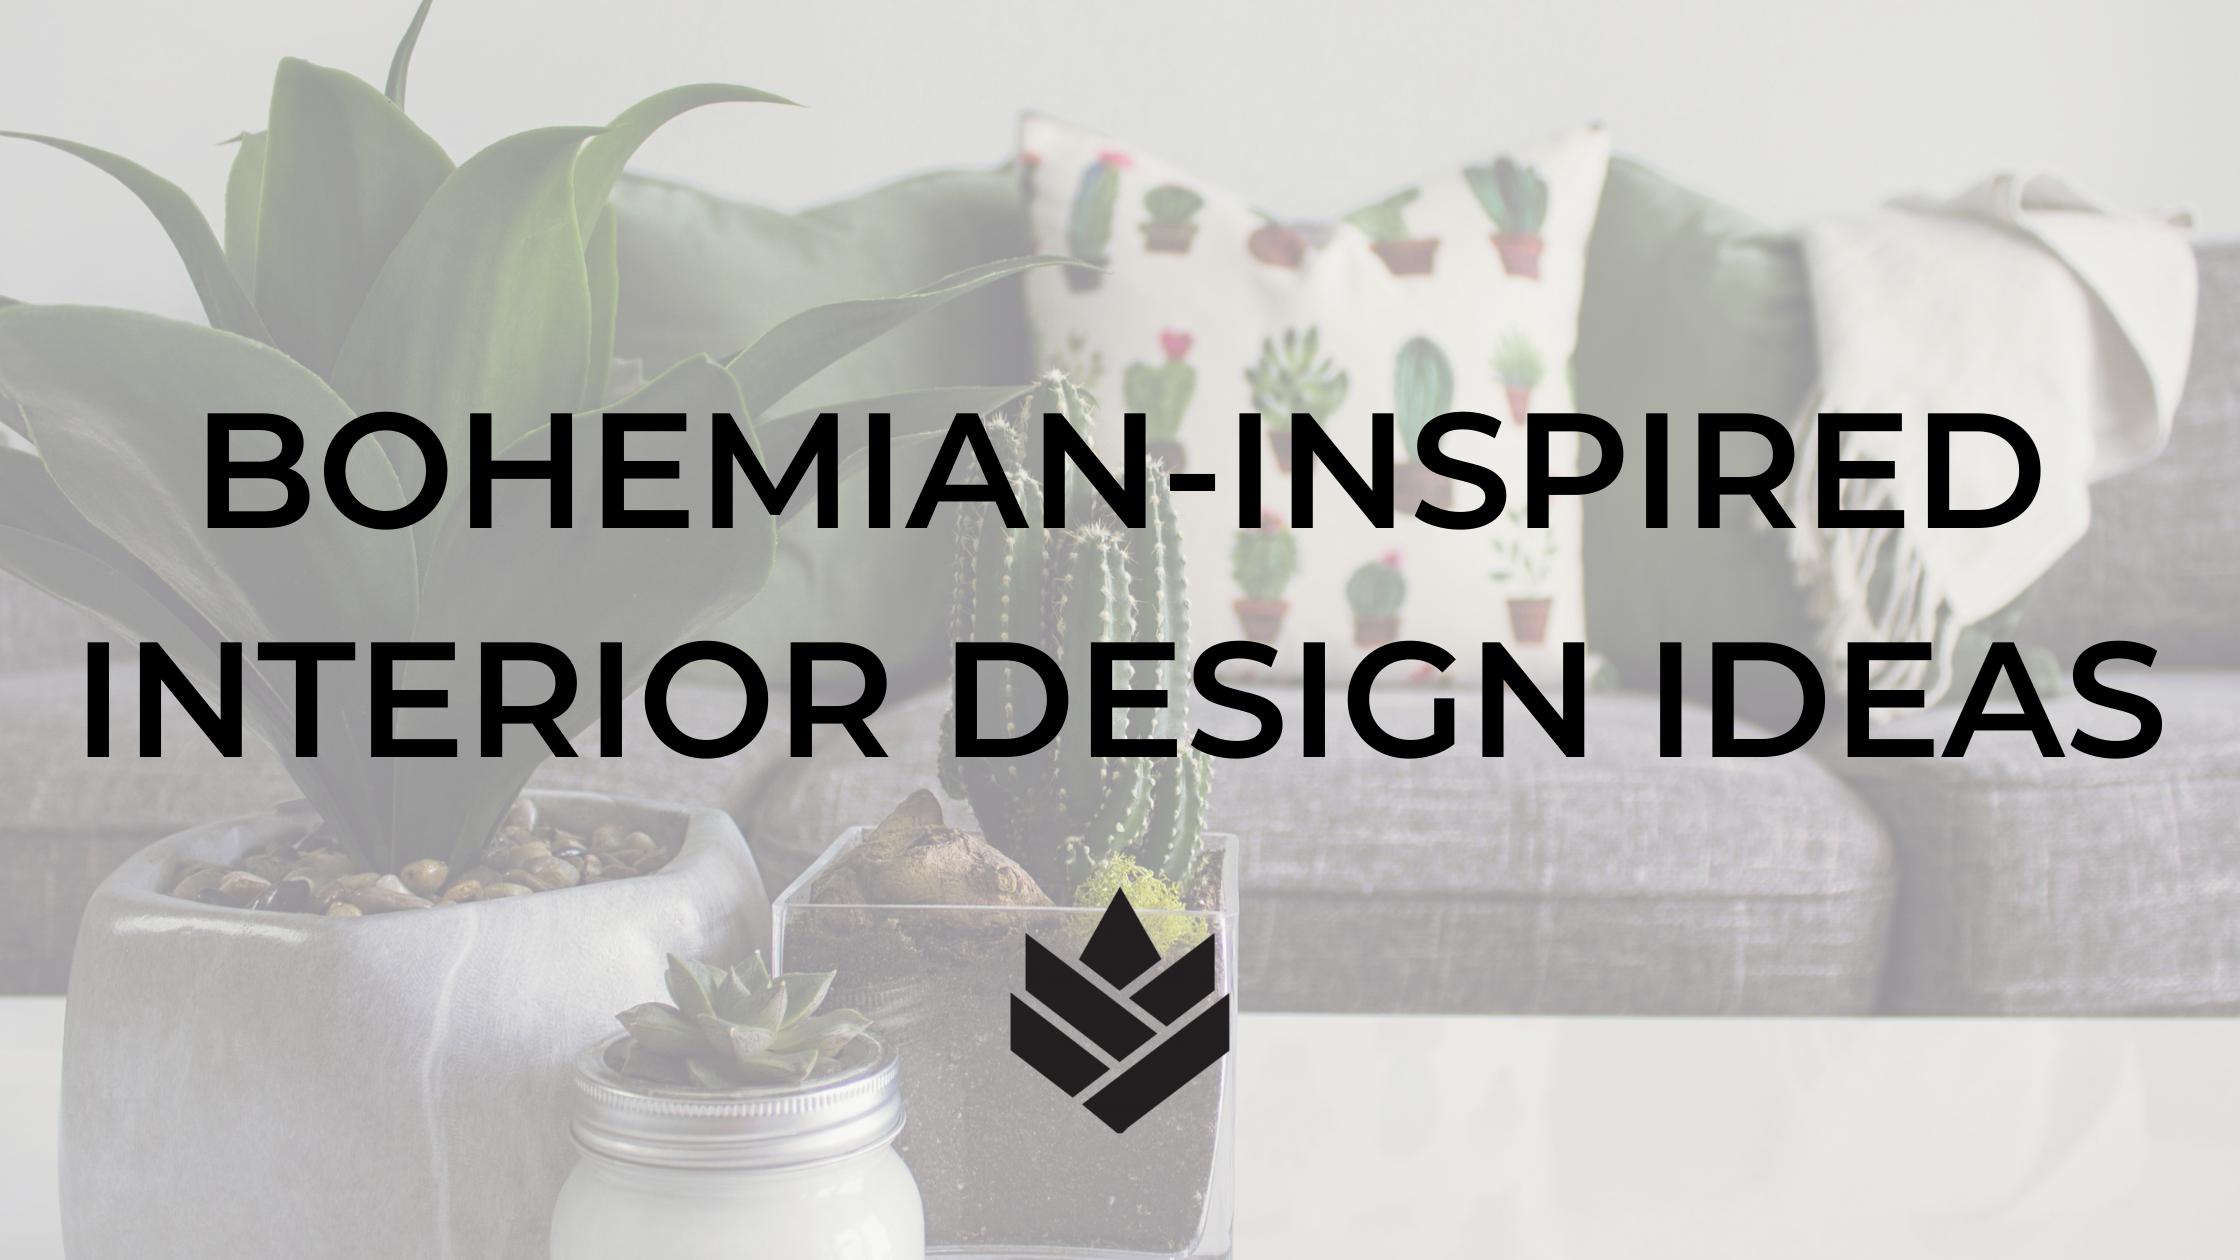 Bohemian-Inspired Interior Design Ideas